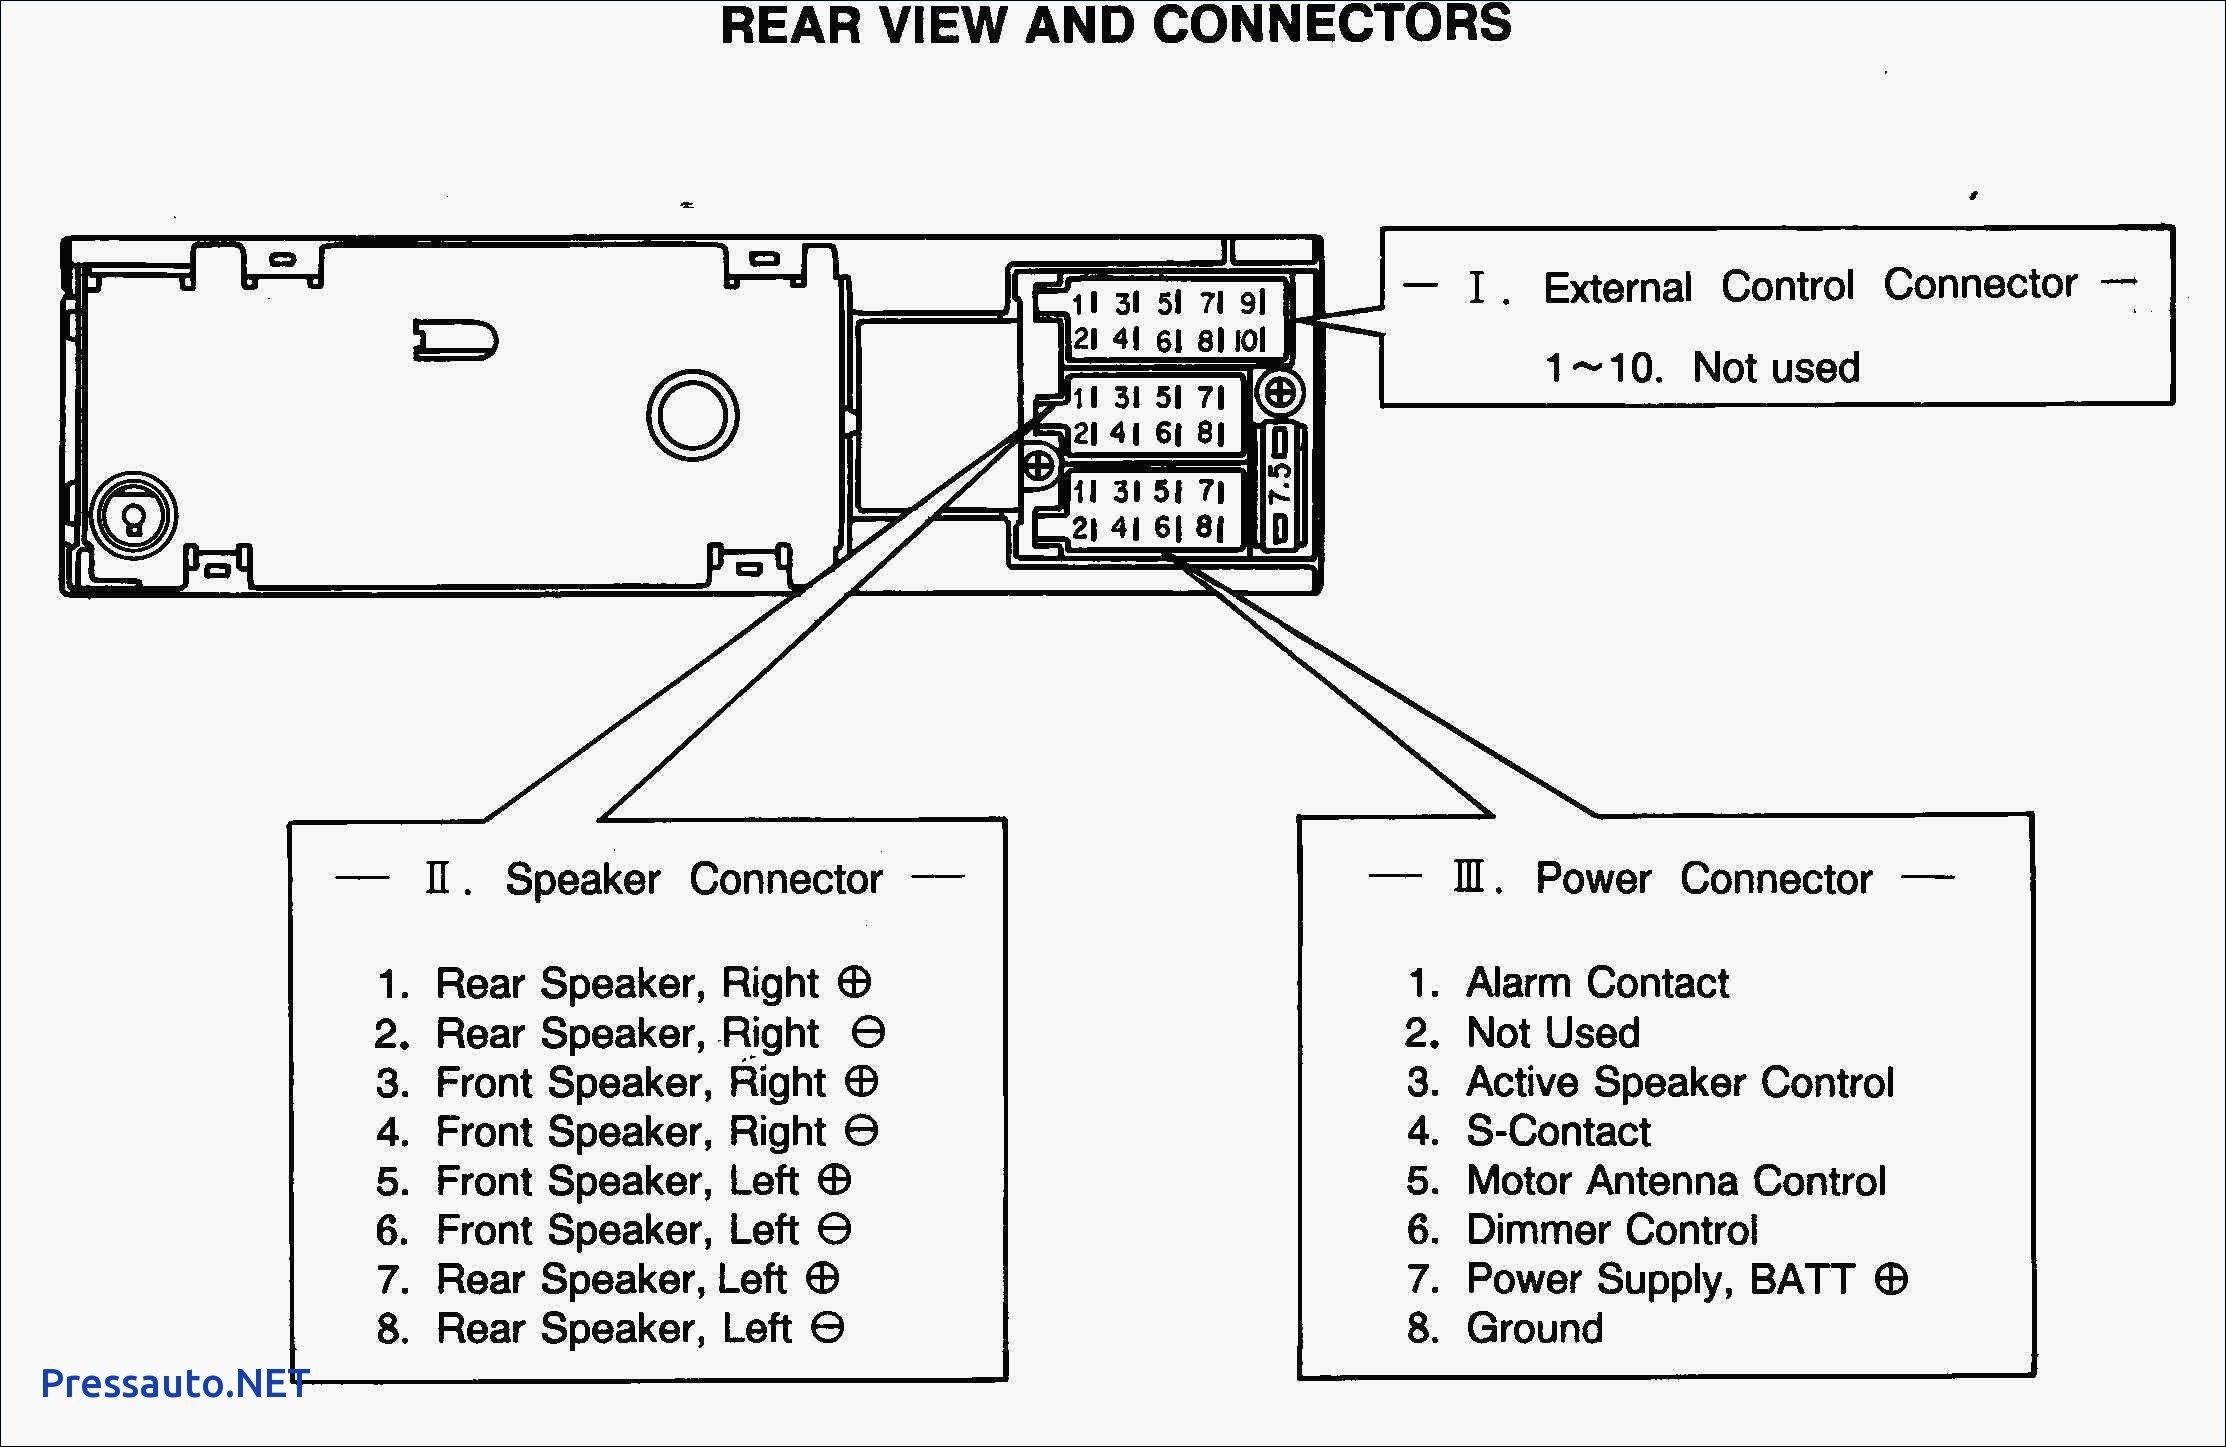 Hopkins Trailer Connector Wiring Diagram Awesome Ez Load Trailer - Hopkins Trailer Plug Wiring Diagram